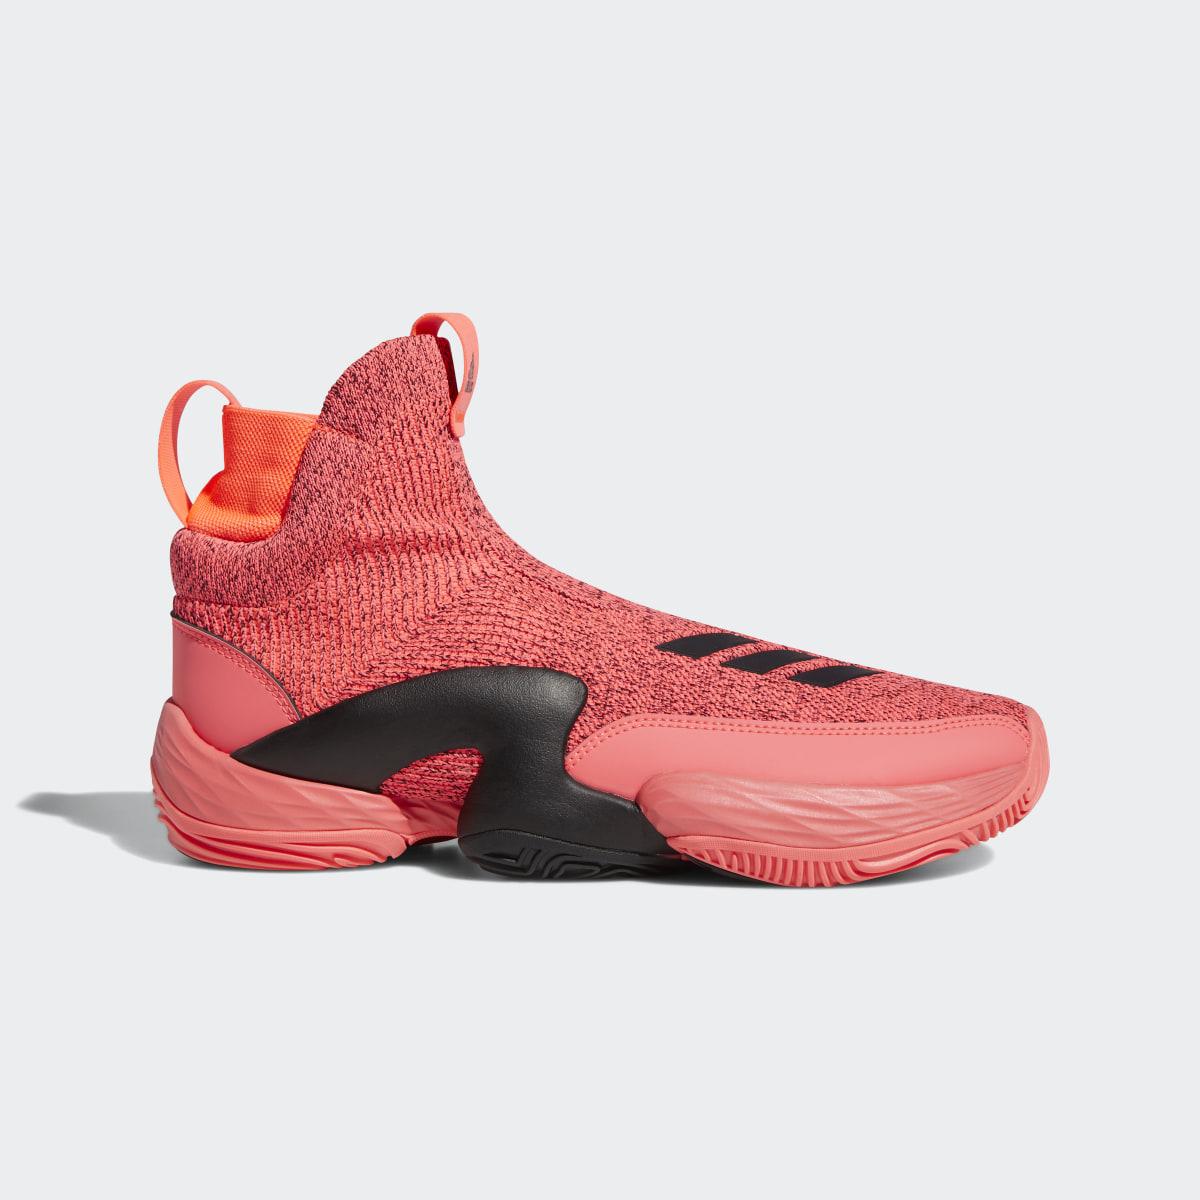 adidas N3XT L3V3L 2020 Shoes - Pink